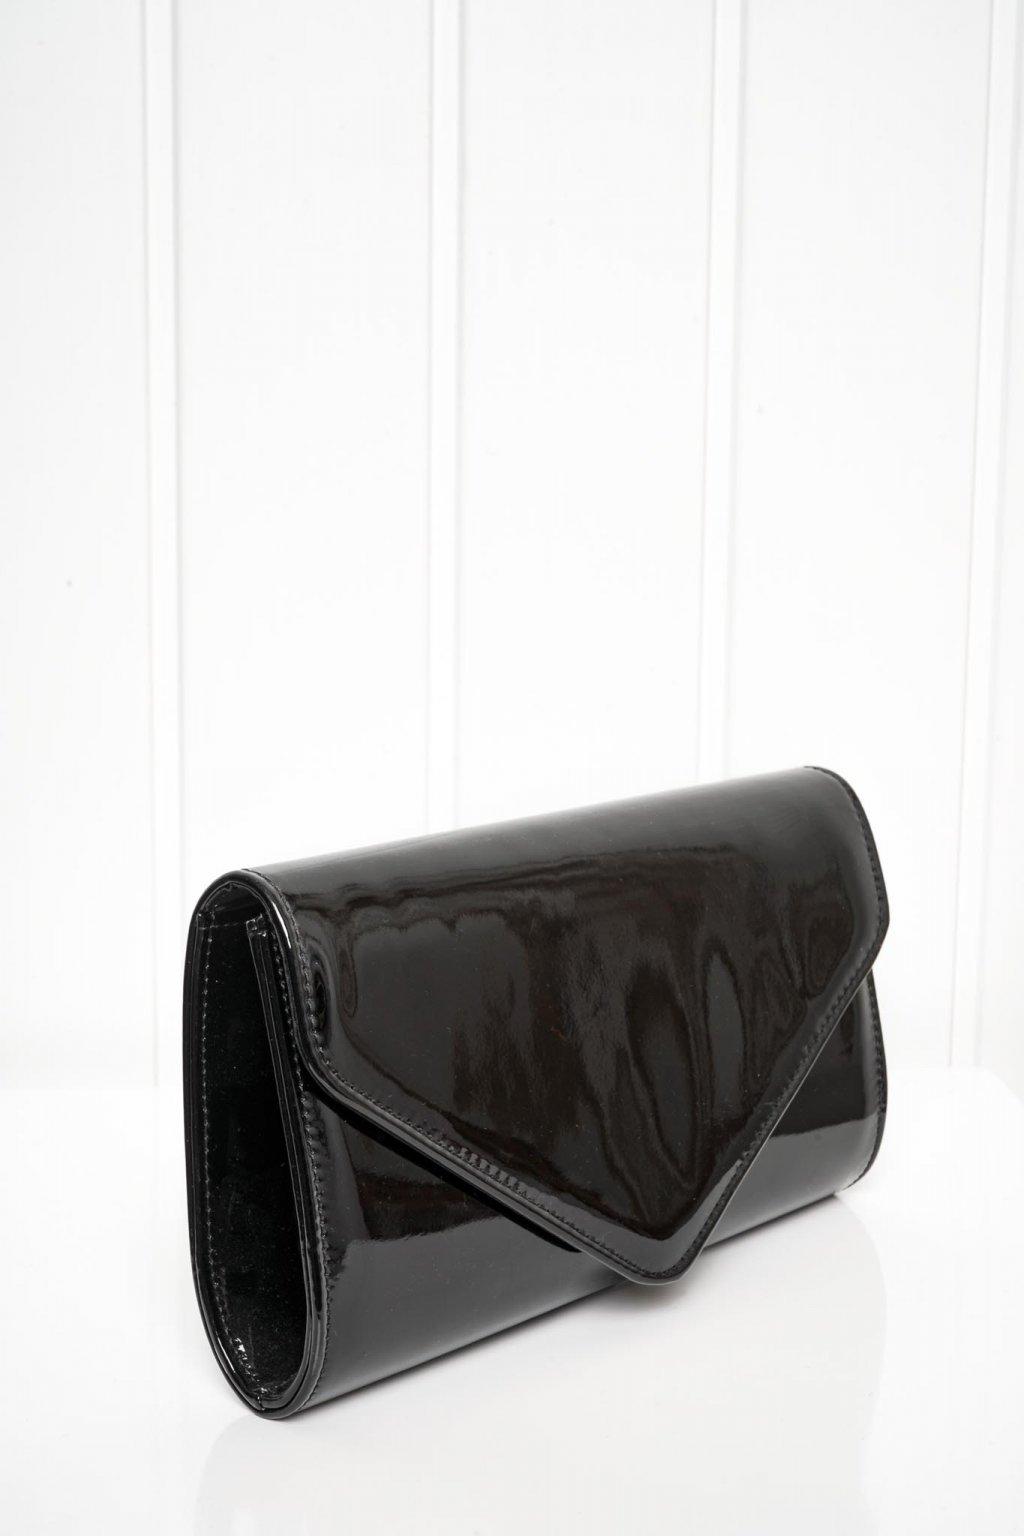 Kabelka, crossbody, ruksak, shopping bag, shopperka, 589